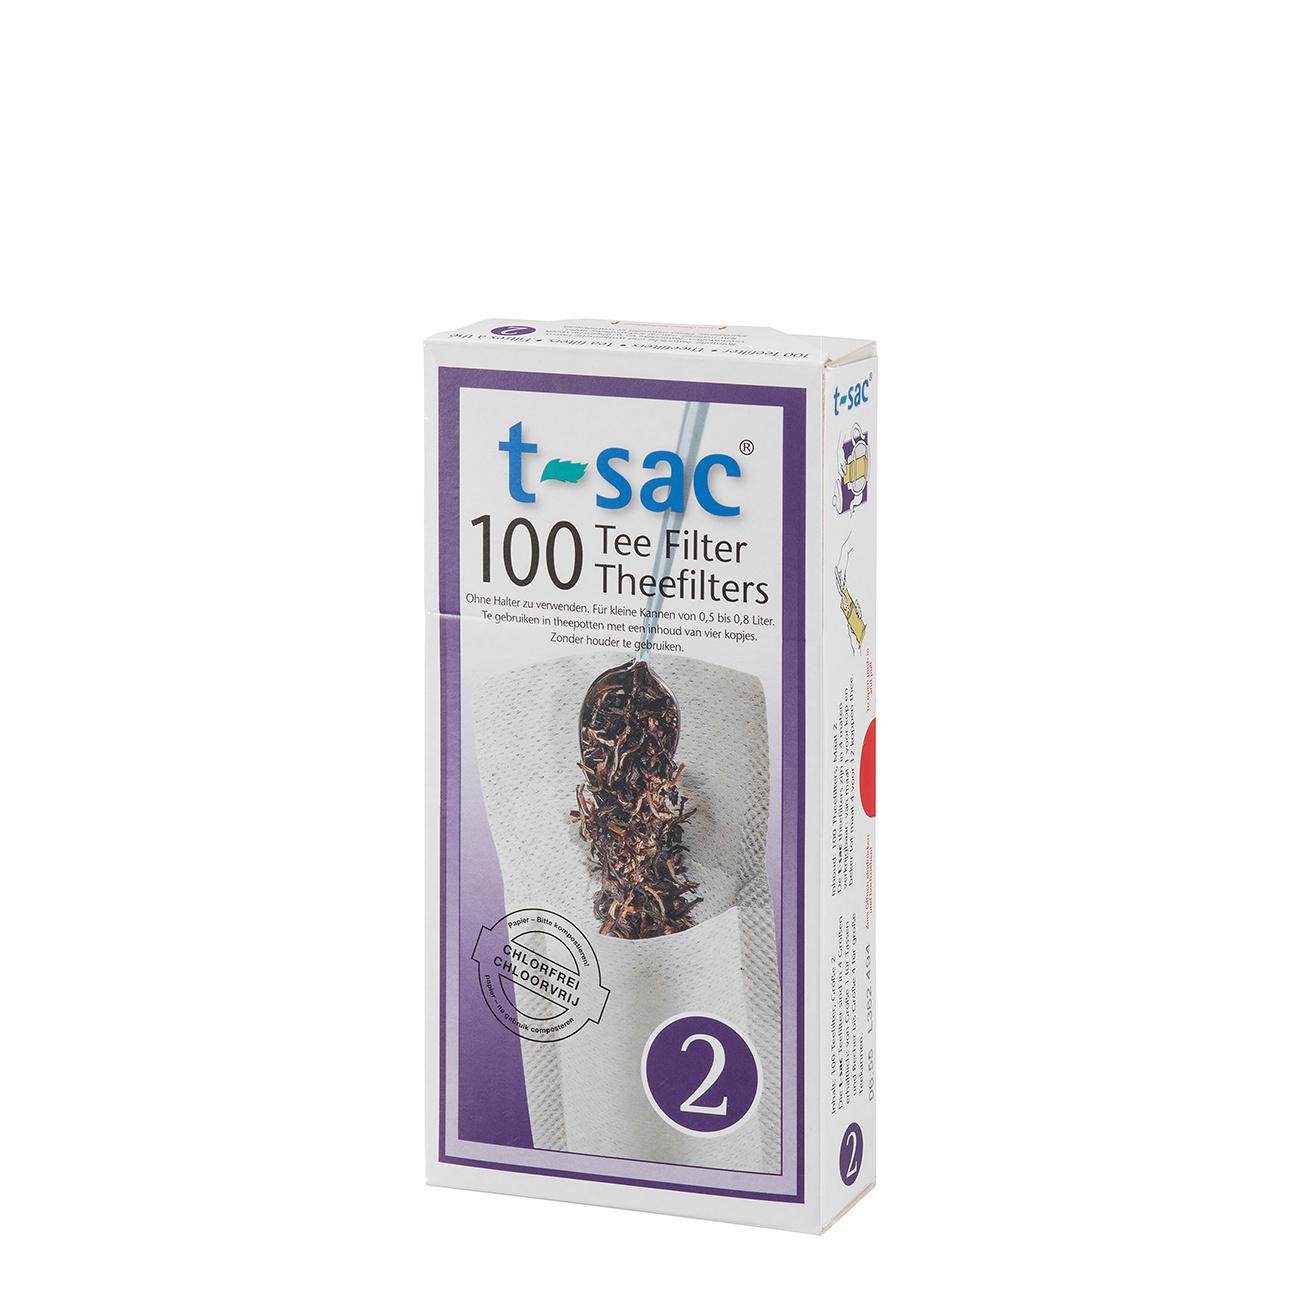 T-sac T-sac Theefilters Nr. 2